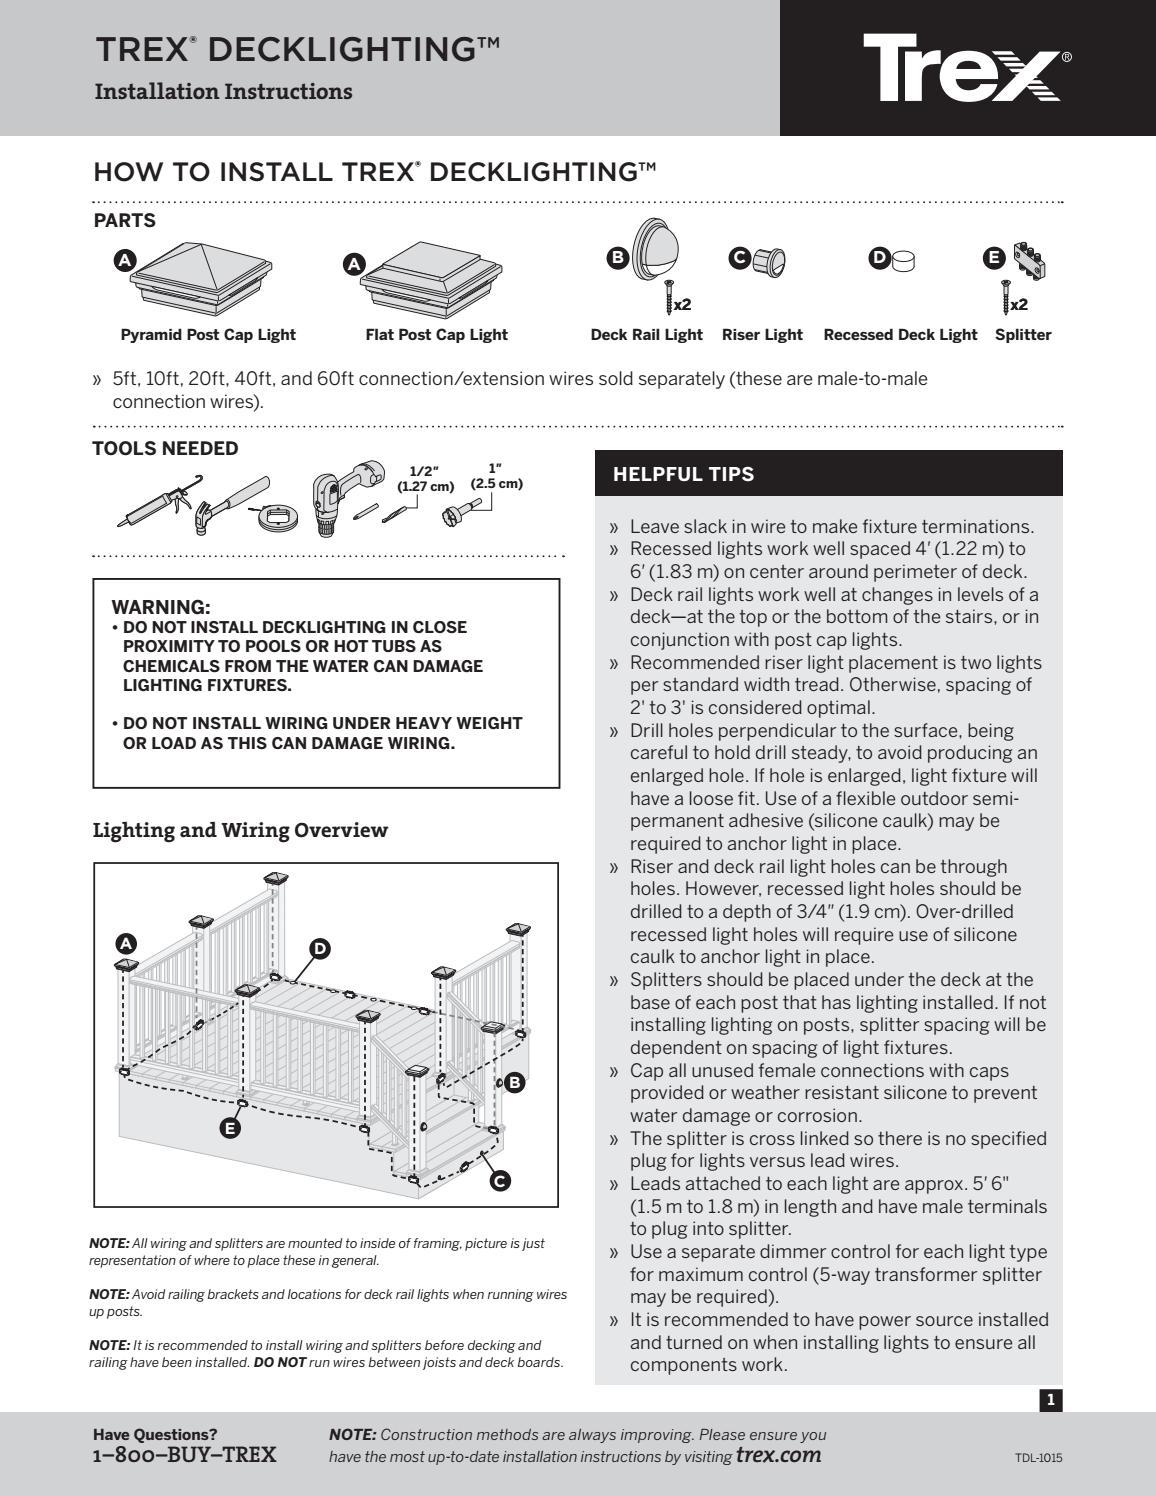 trex deck lighting installation guide